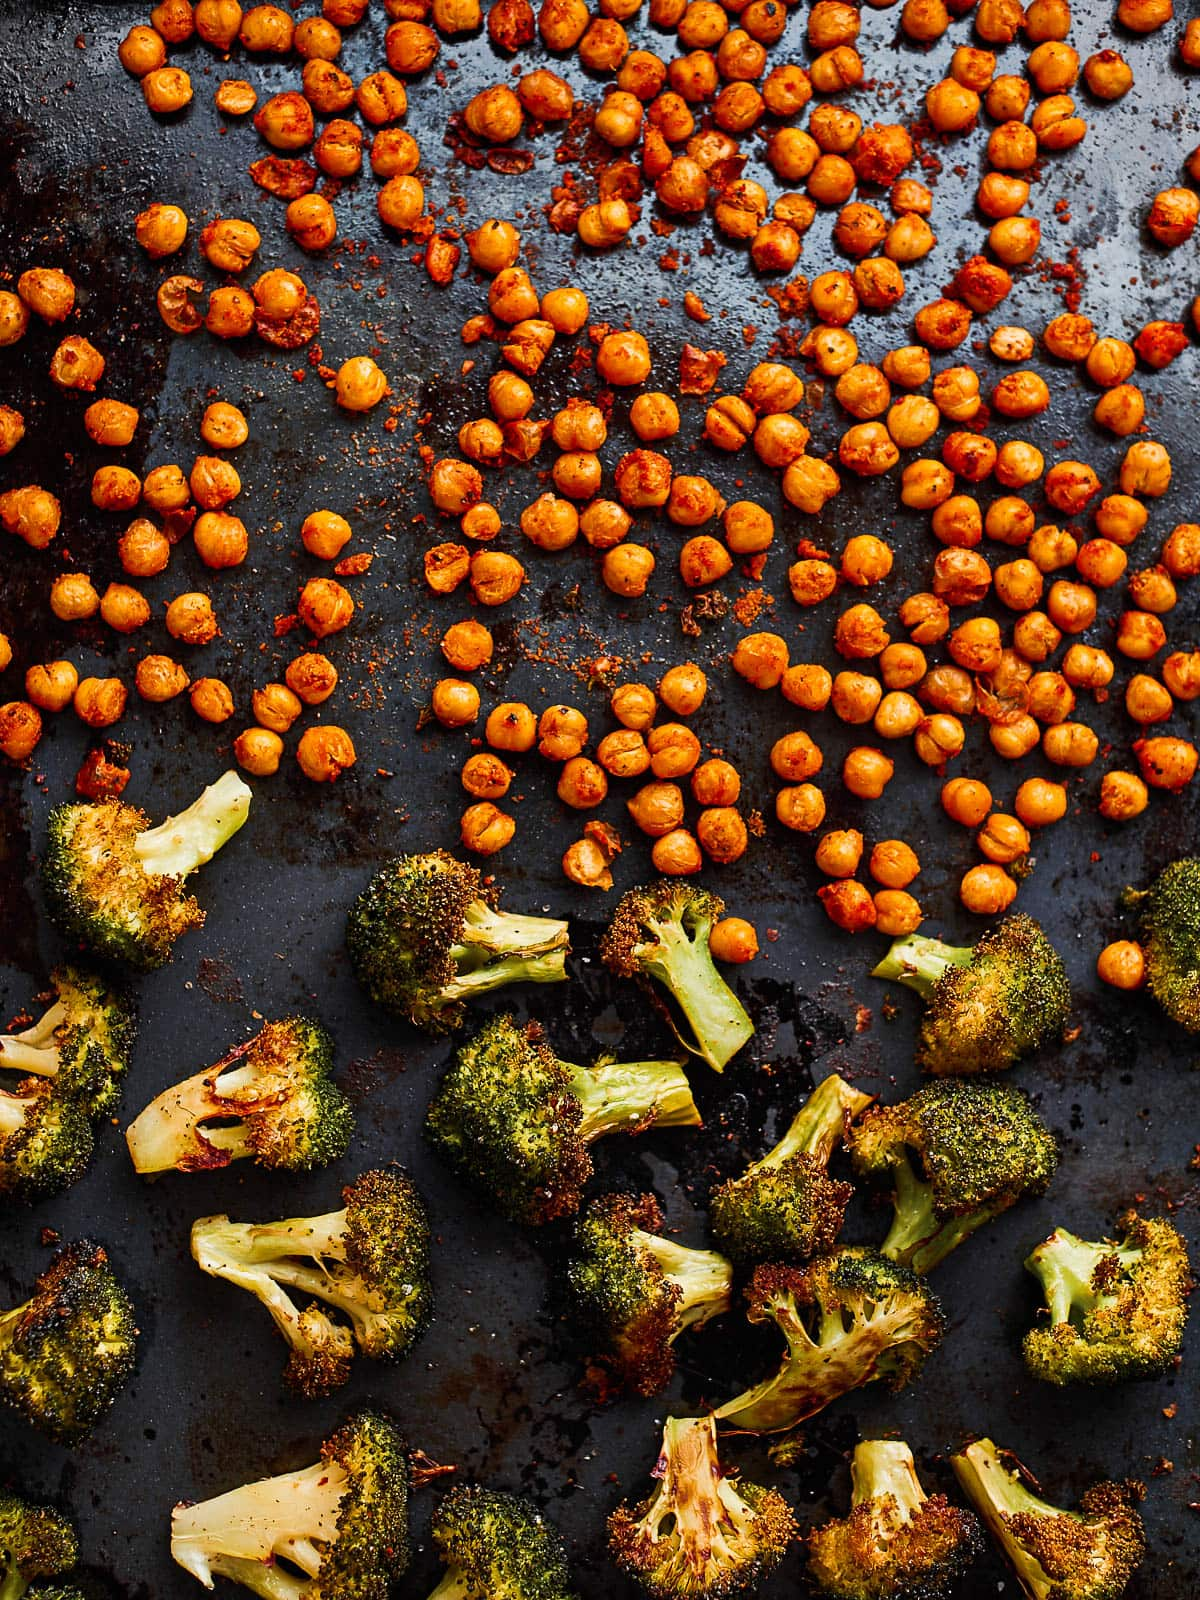 Roasted broccoli and chickpeas